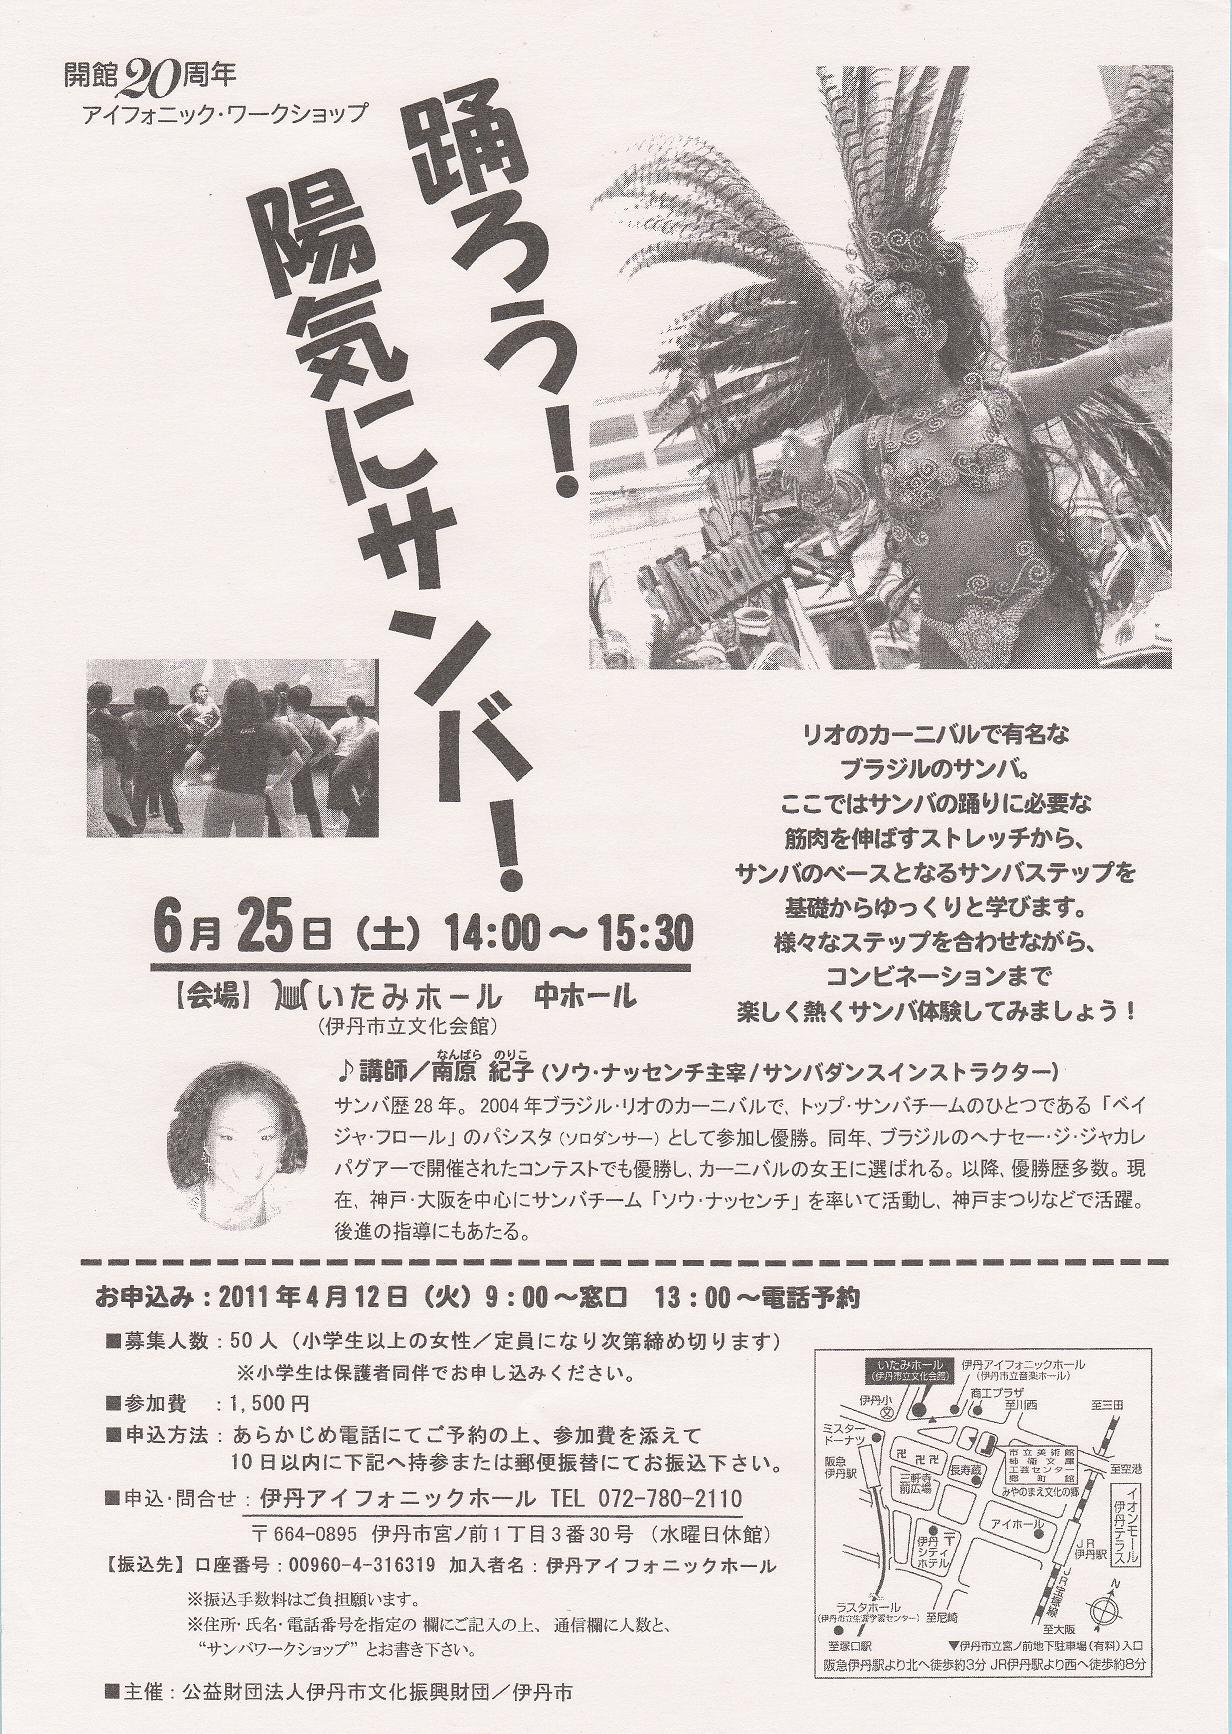 2011_06_25_itami.JPG